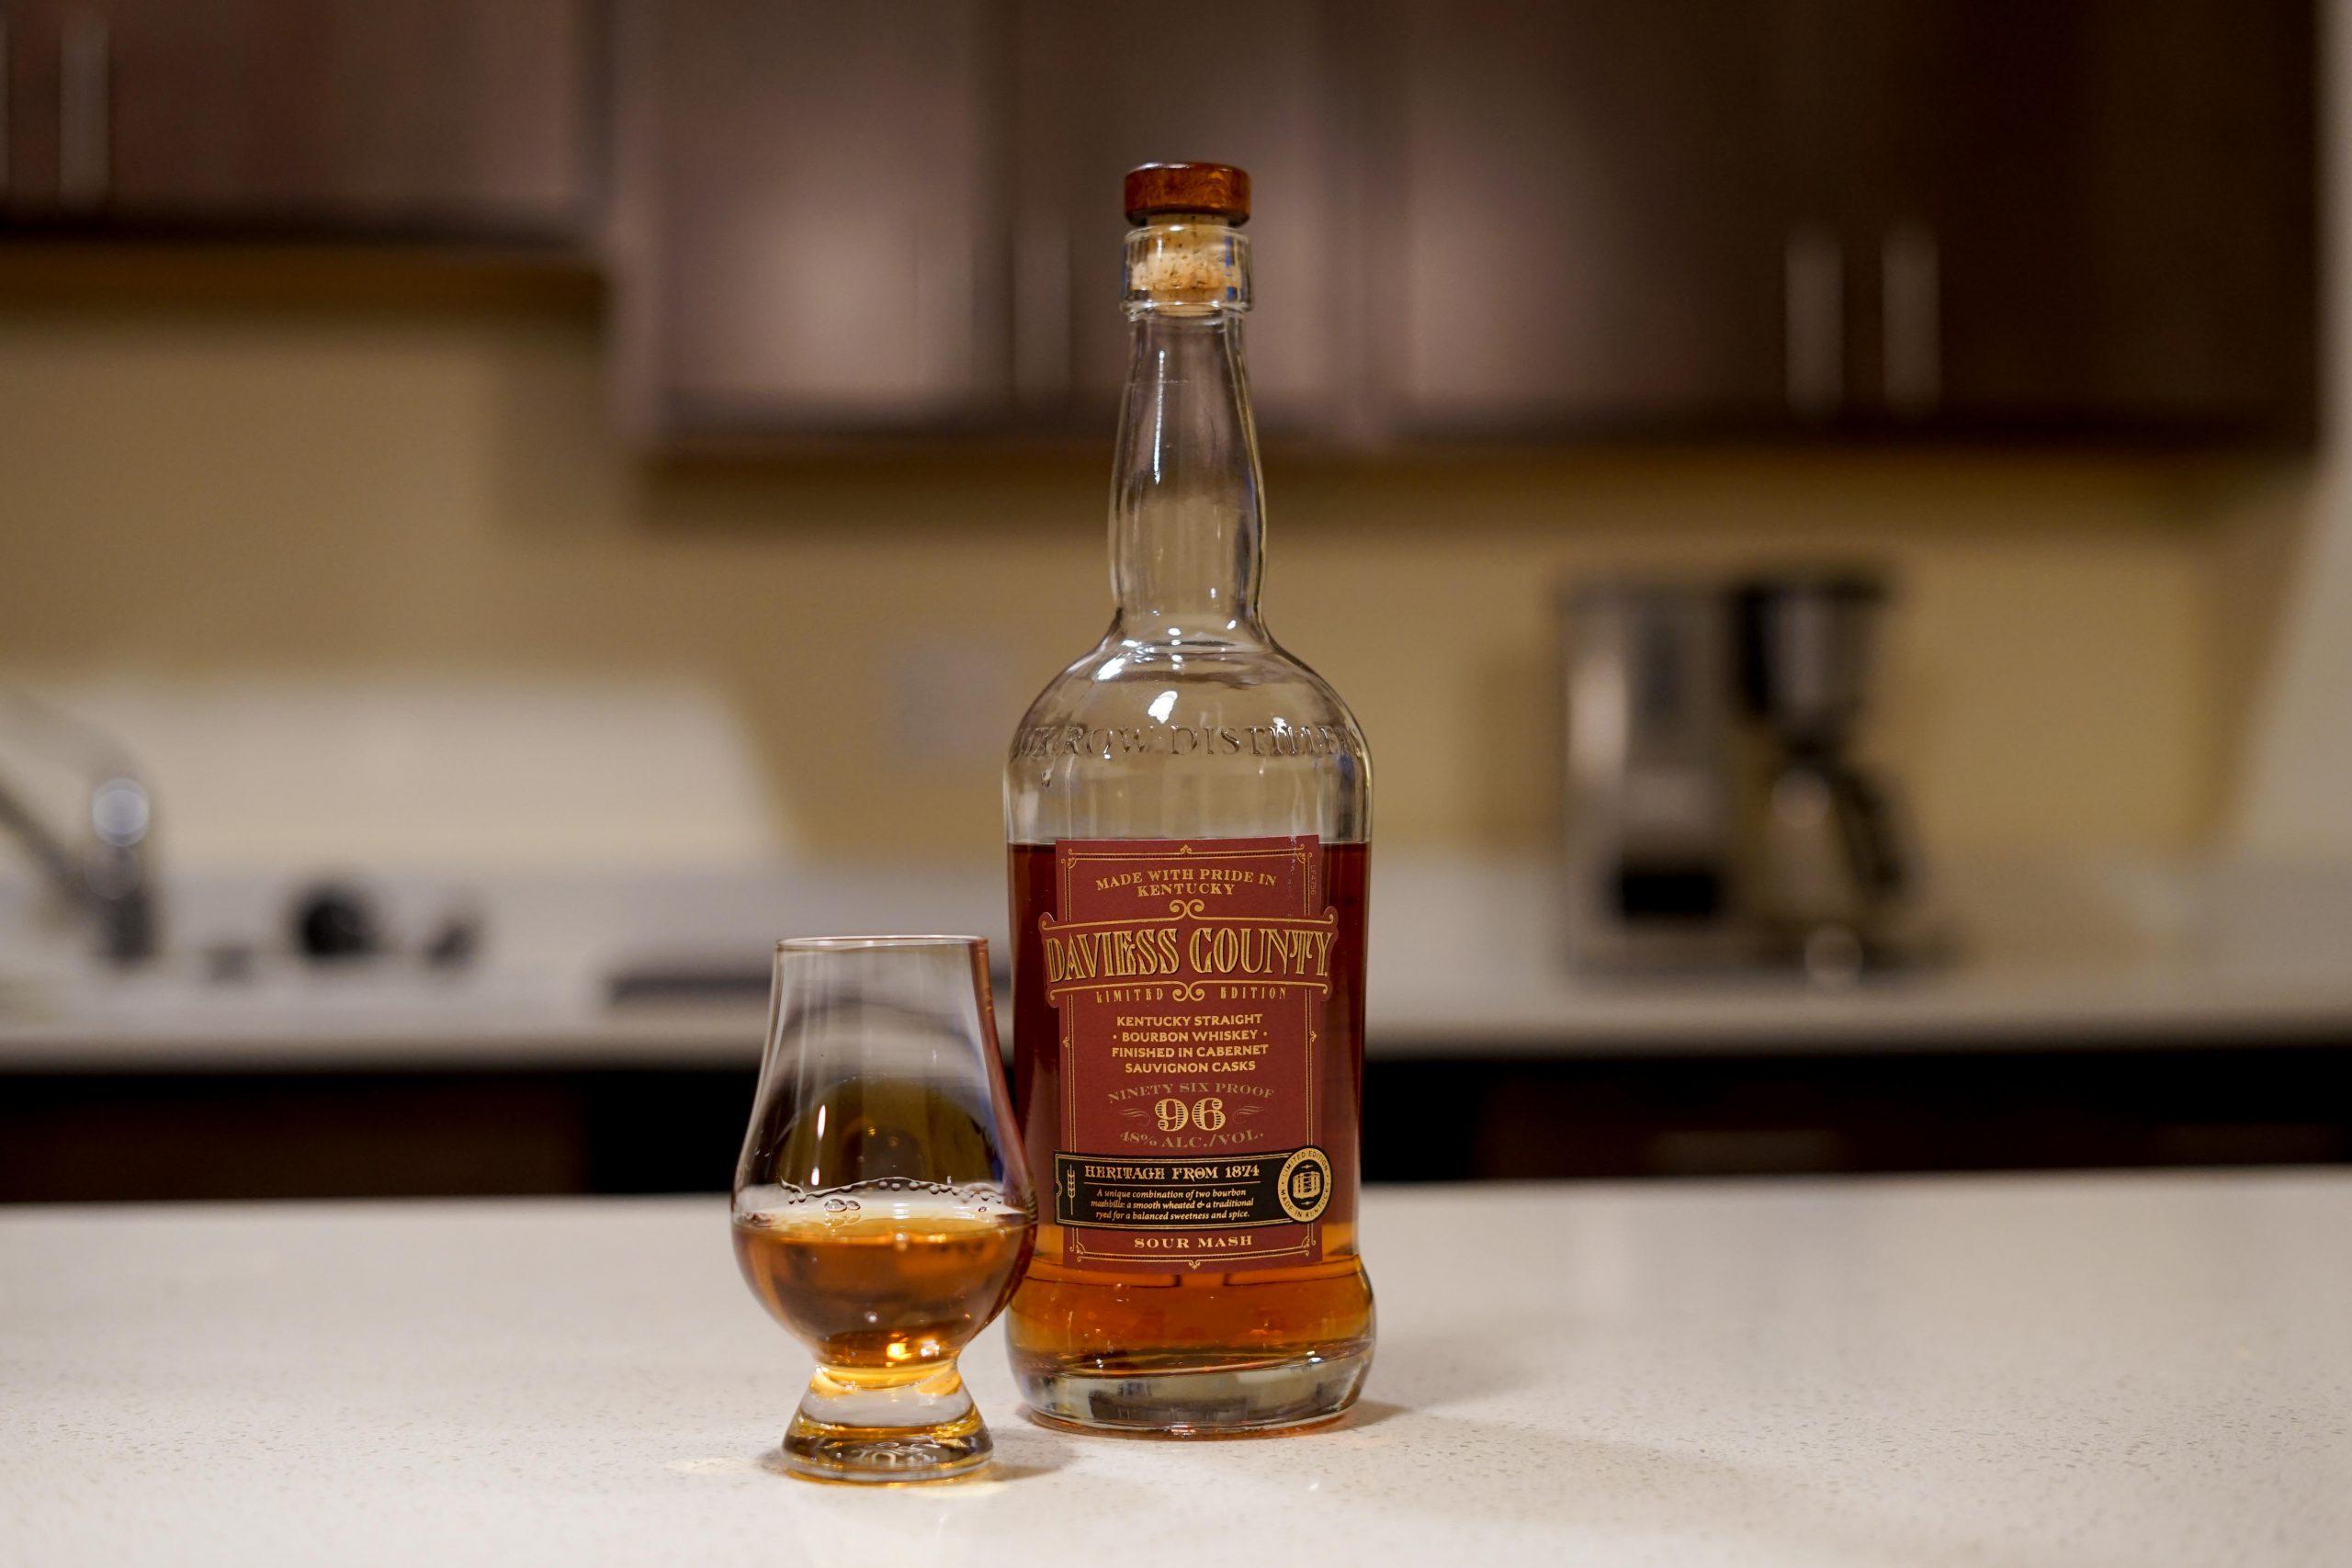 Daviess County Cabernet Finished Bourbon